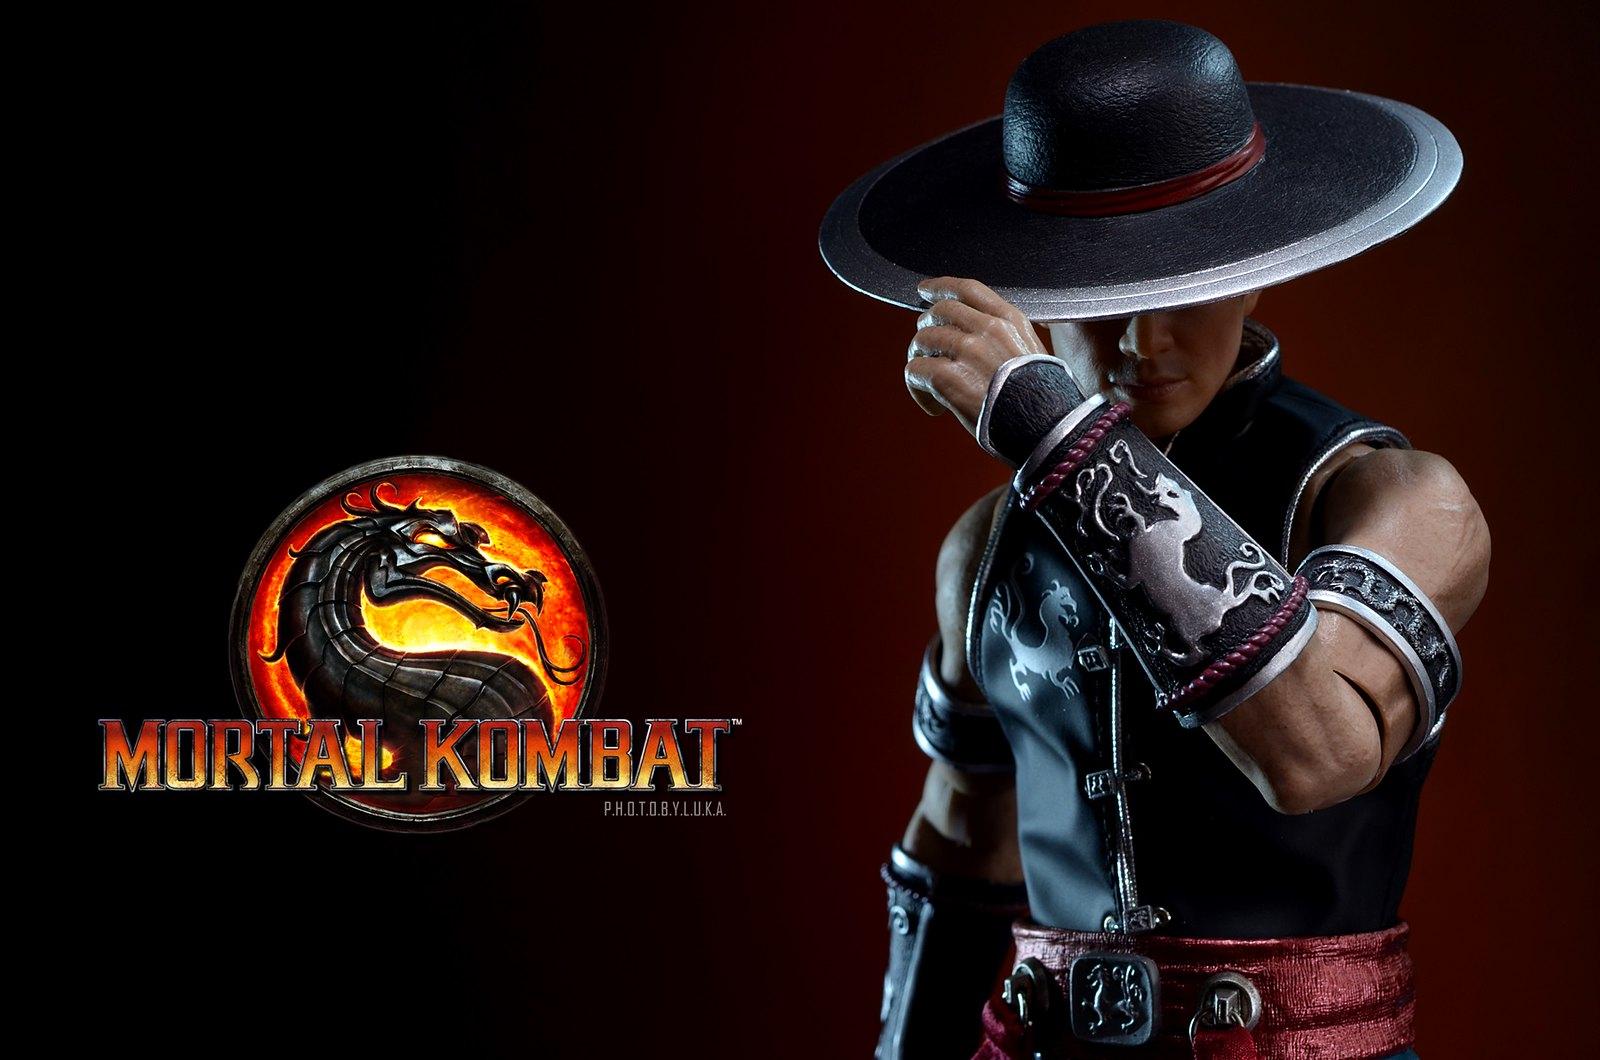 [World Box] Mortal Kombat: Kung Lao Lançado!! - Página 2 15971653147_ab84eed448_h